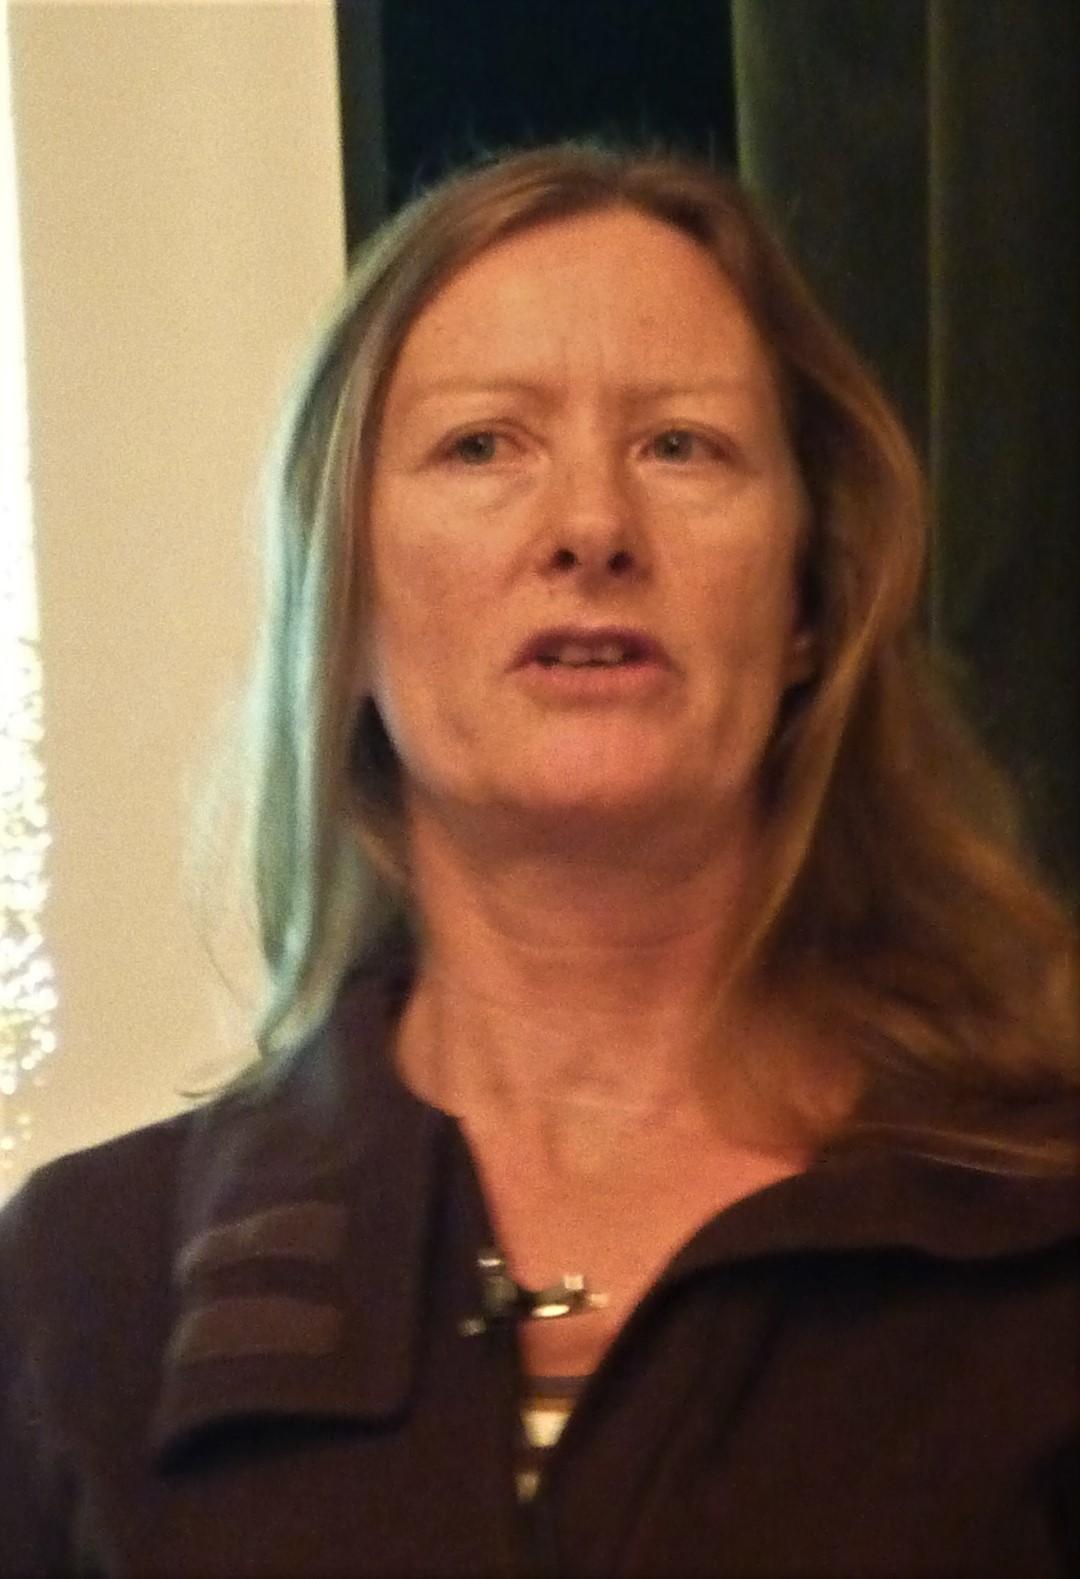 190224 Dunsfold Lisa Scott2